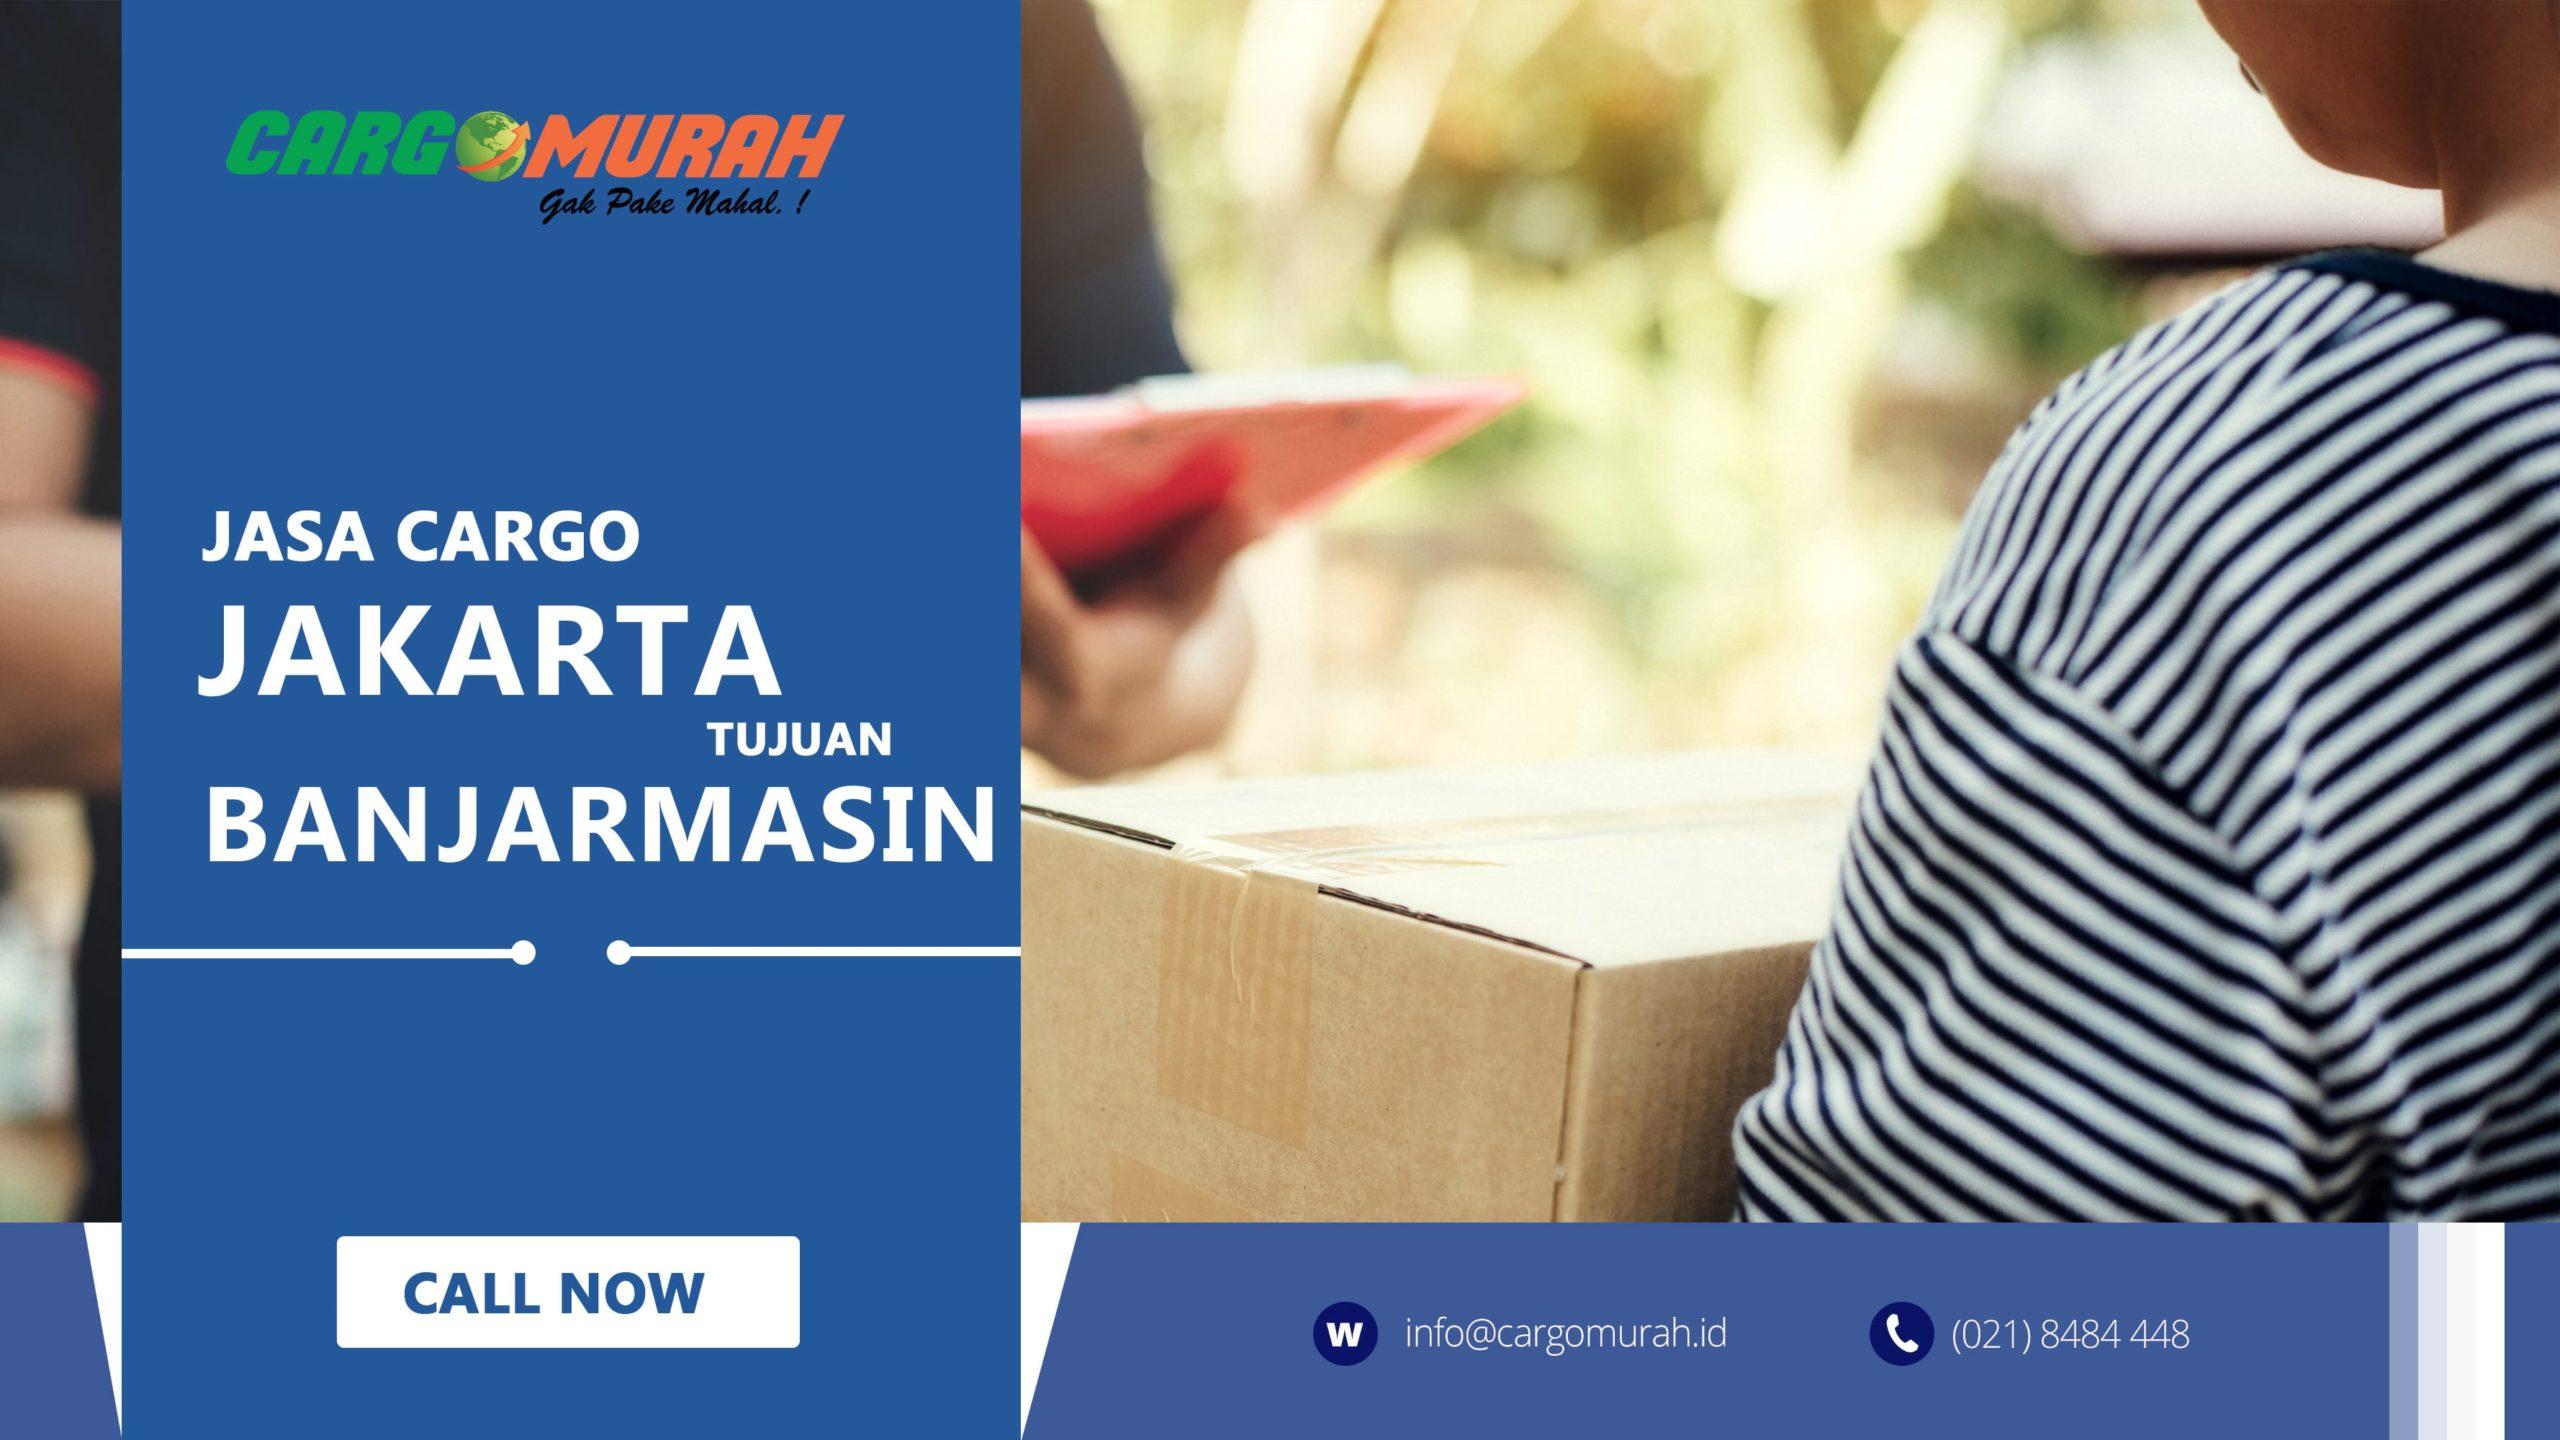 Jasa Cargo Jakarta ke Banjarmasin Kalimantan Selatan